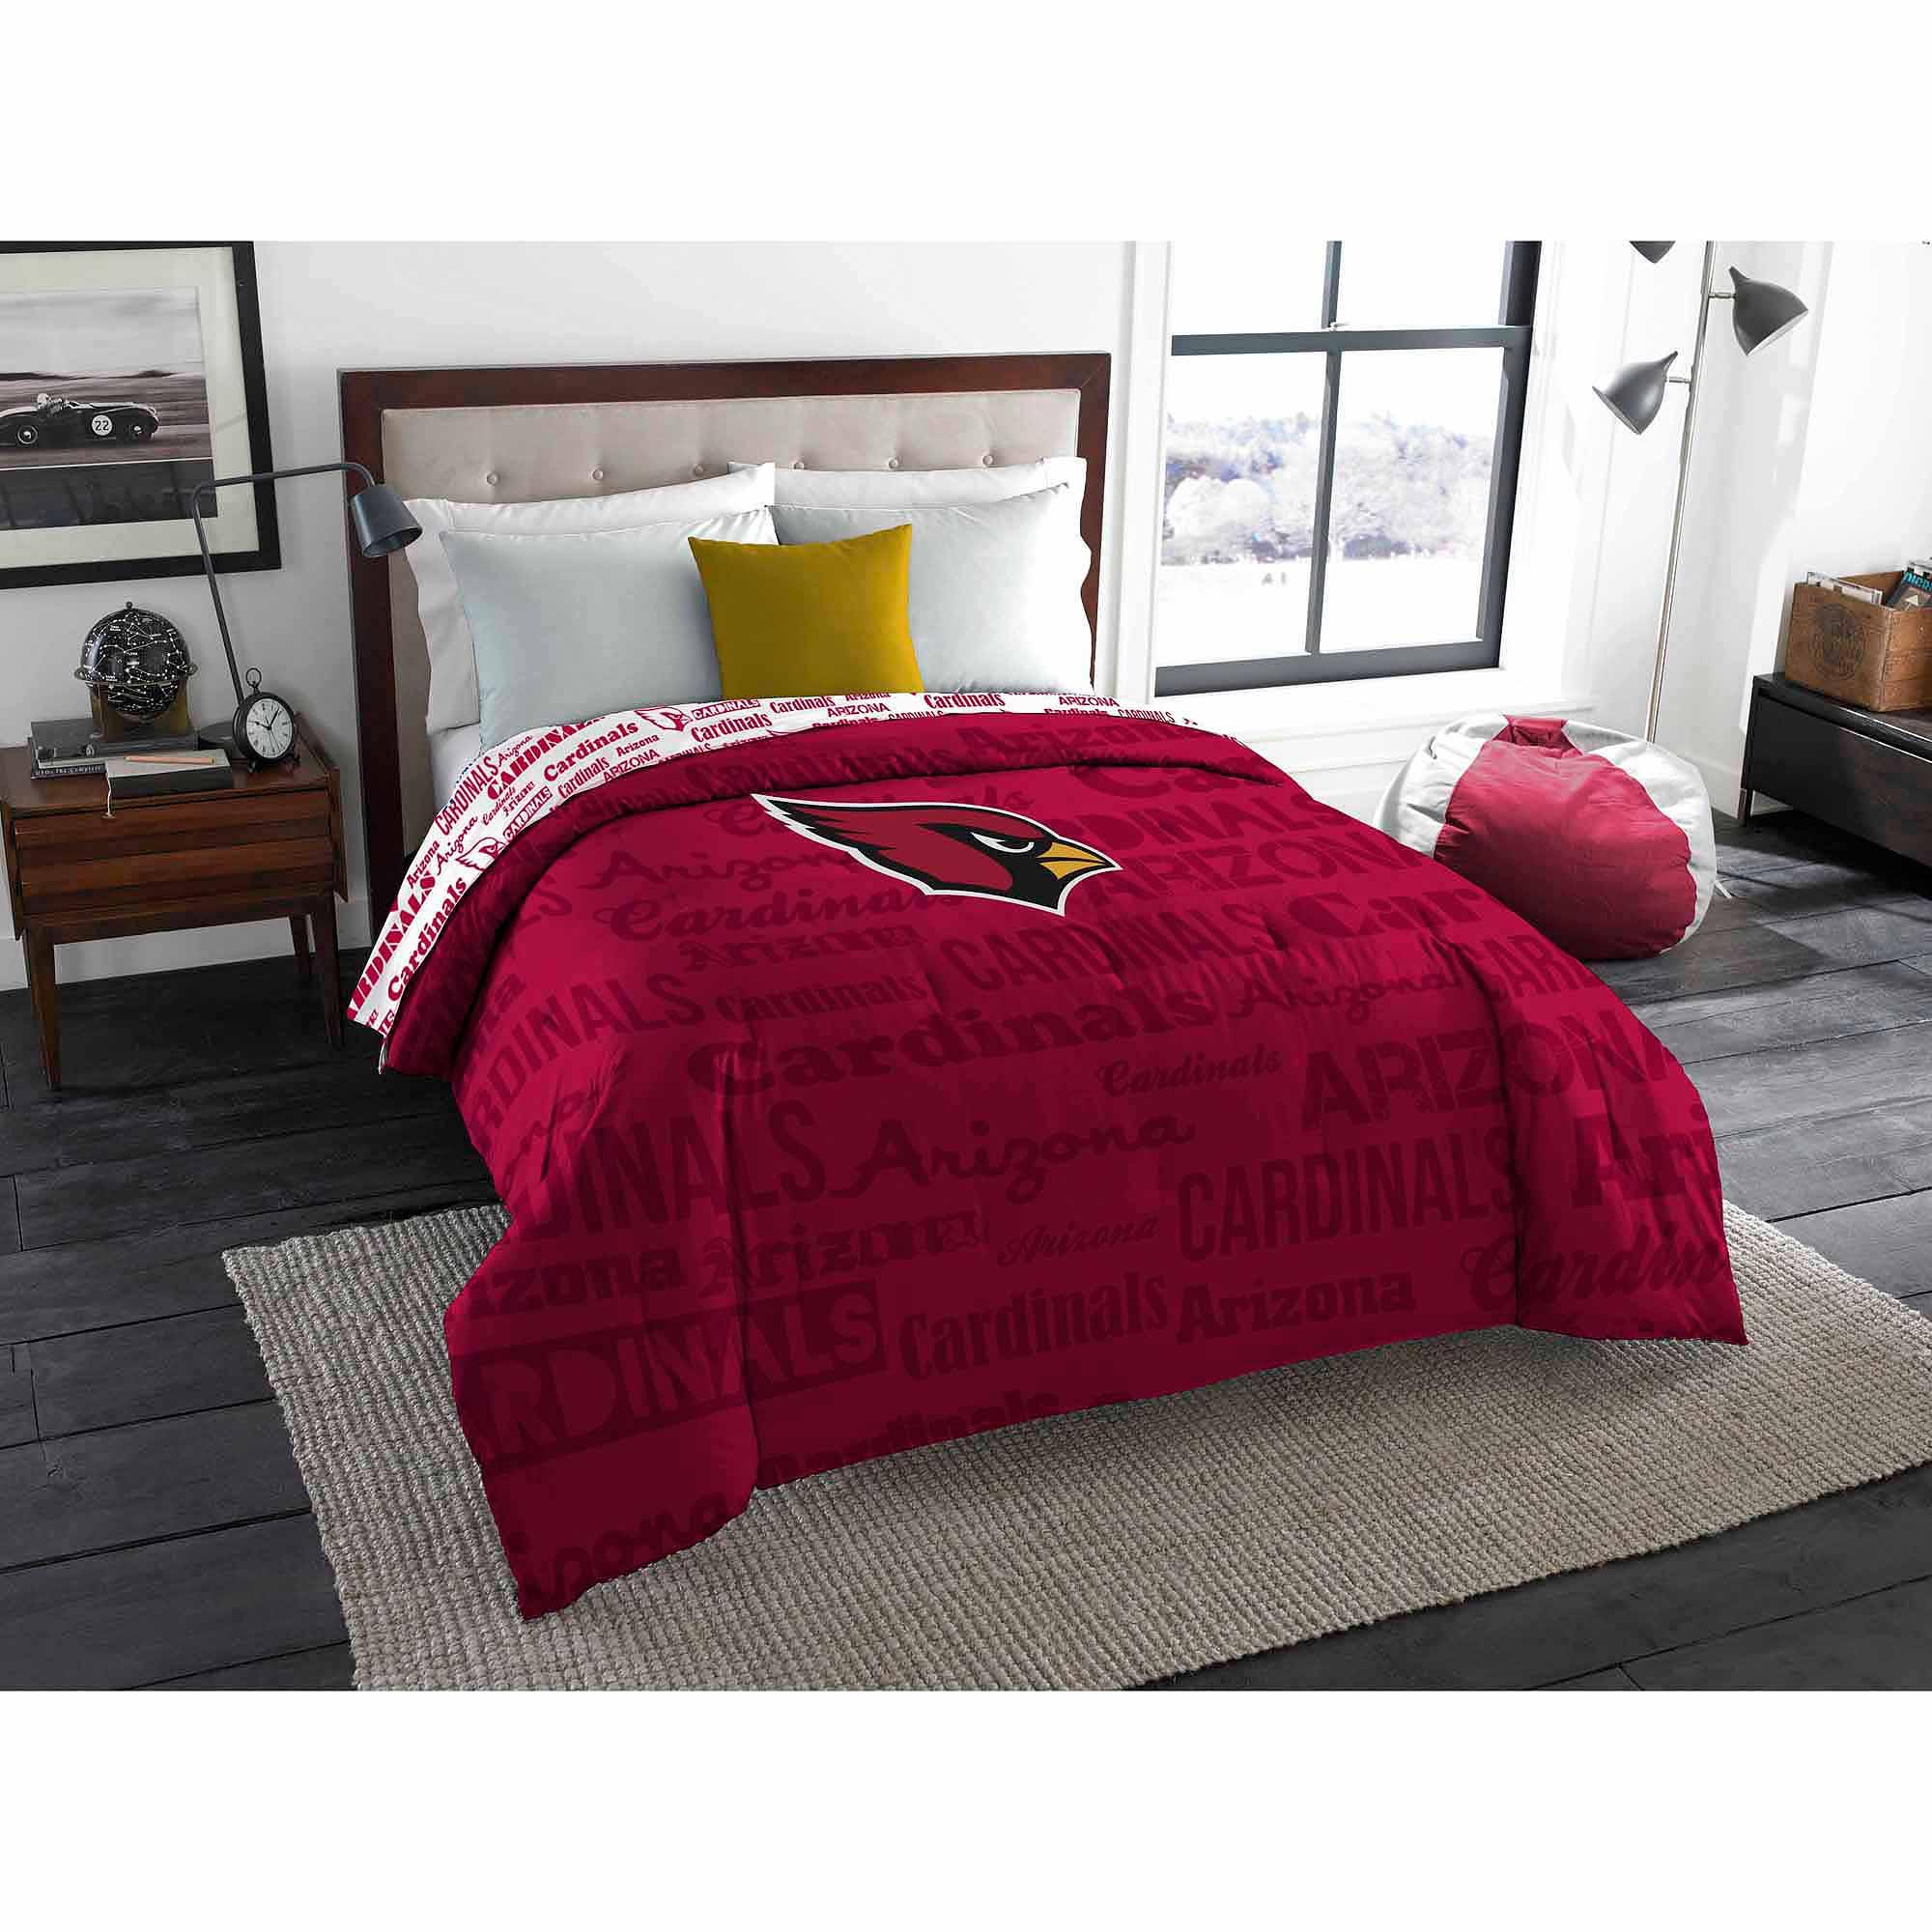 NFL Arizona Cardinals Twin/Full Bedding Comforter